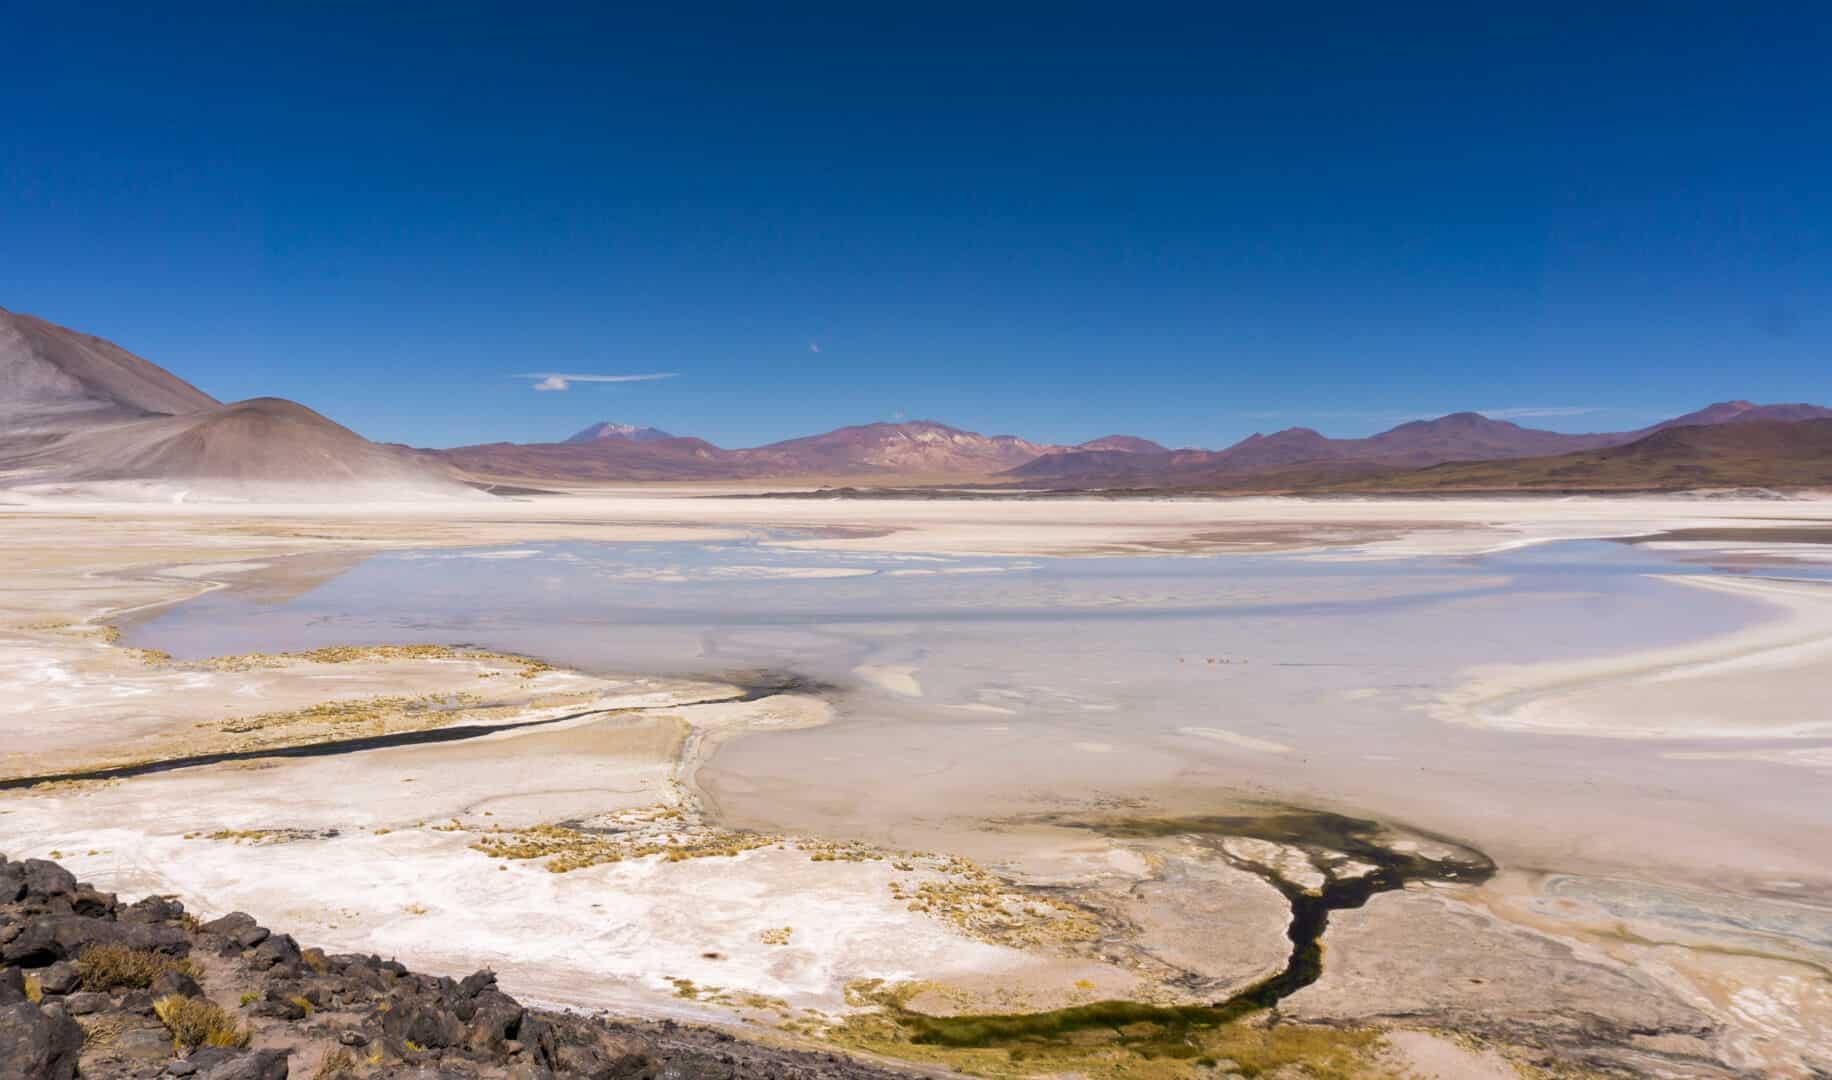 Salt flats and lagoons in the Atacama Desert